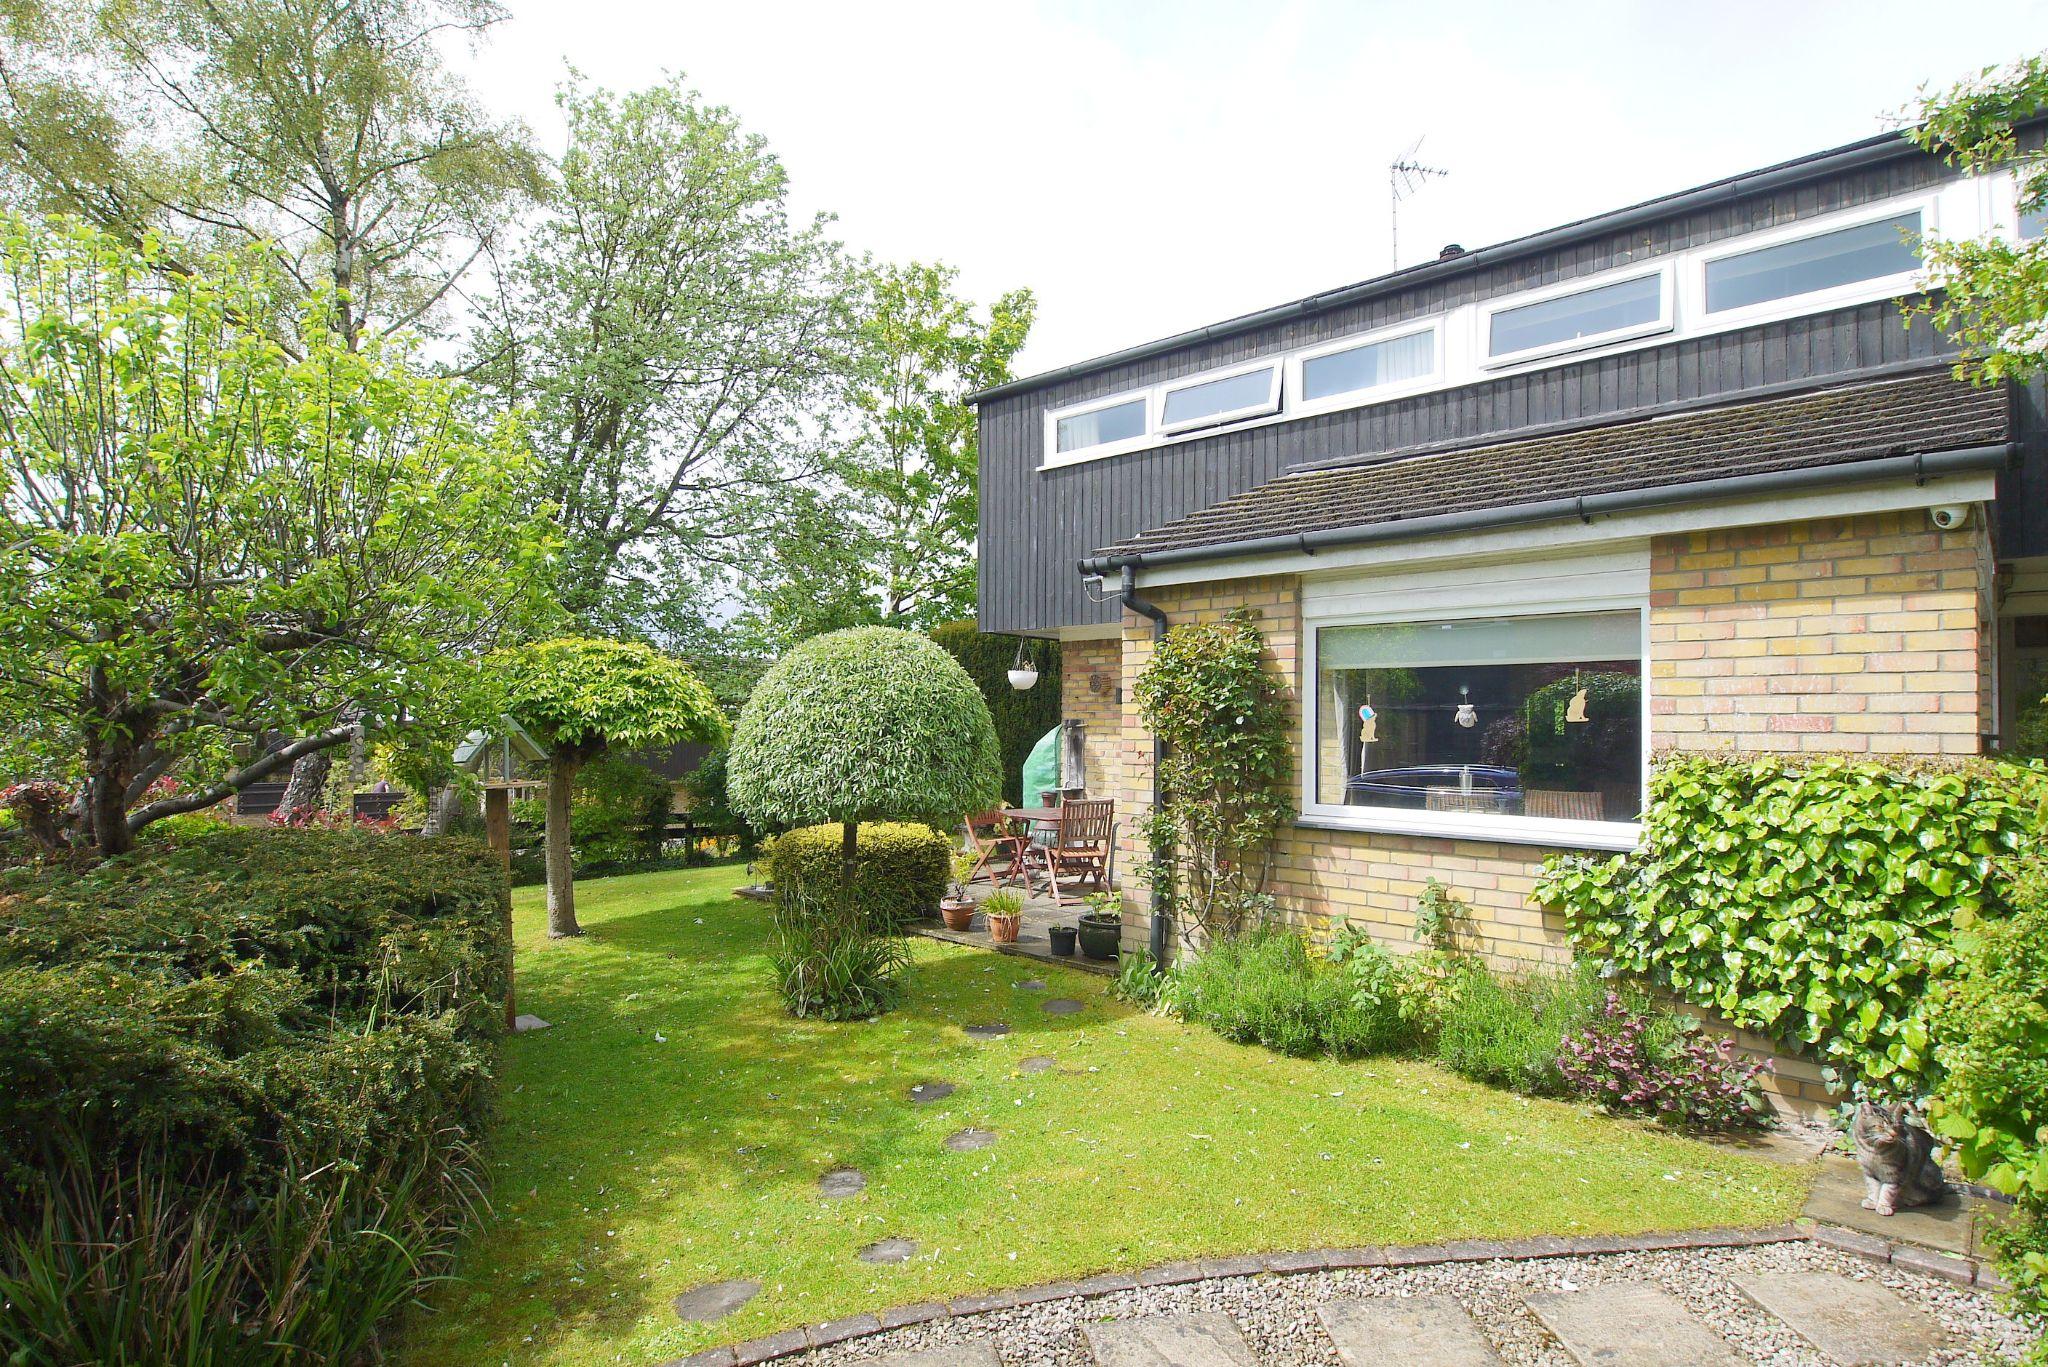 3 bedroom semi-detached house Sold in Sevenoaks - Photograph 1